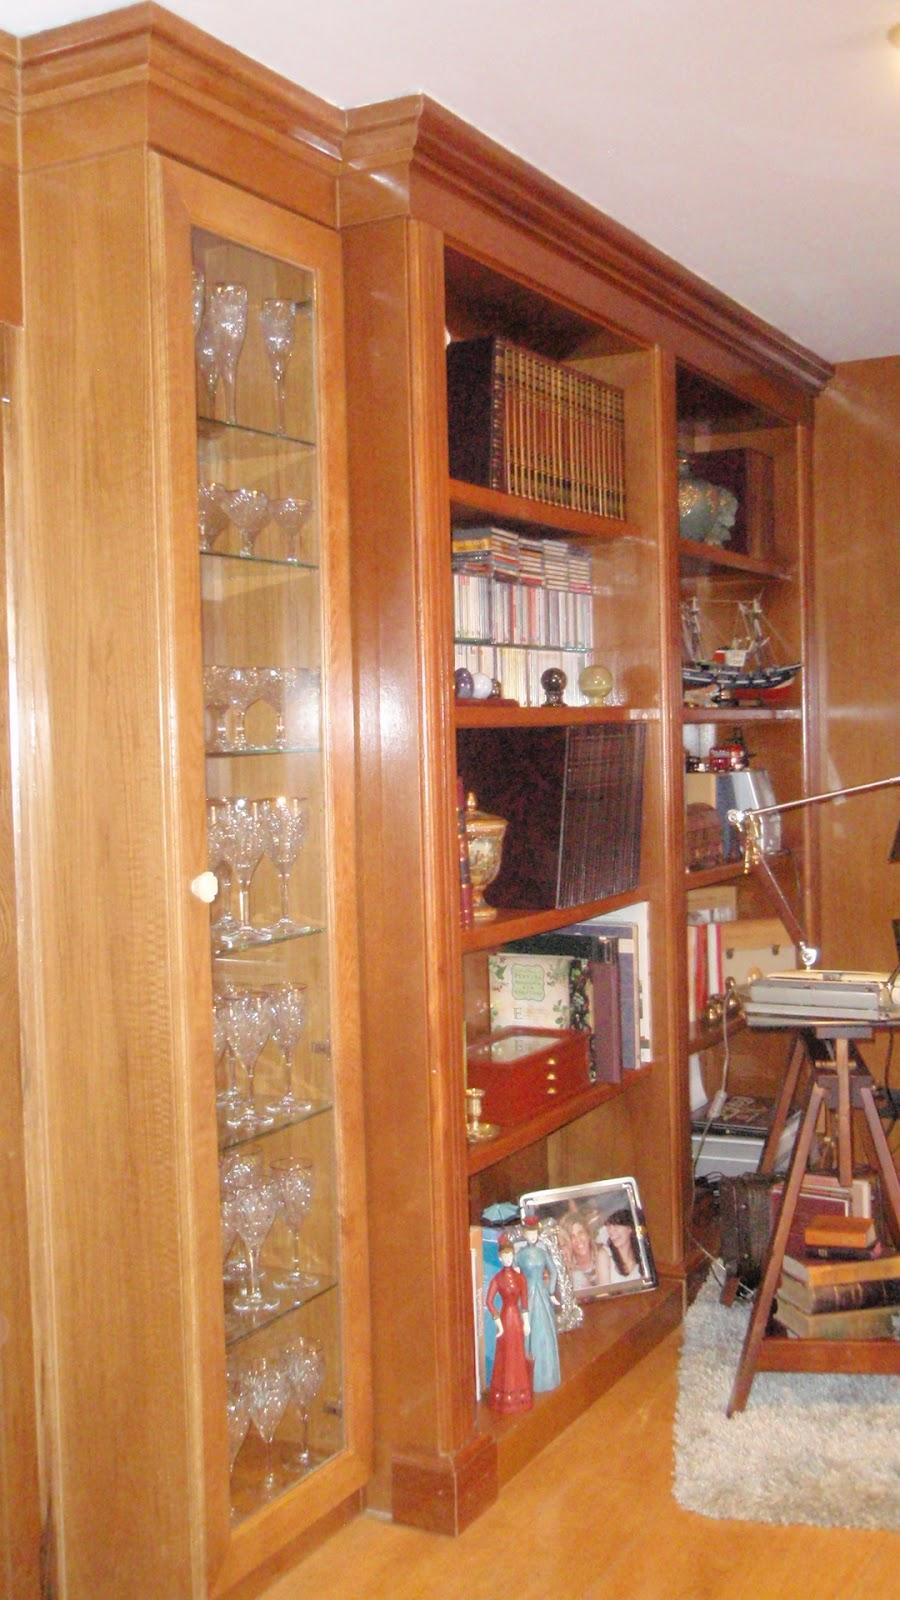 Estanter a de madera empotrada pared completa carpinter a y restauraci n de muebles a medida - Estanterias de madera a medida ...